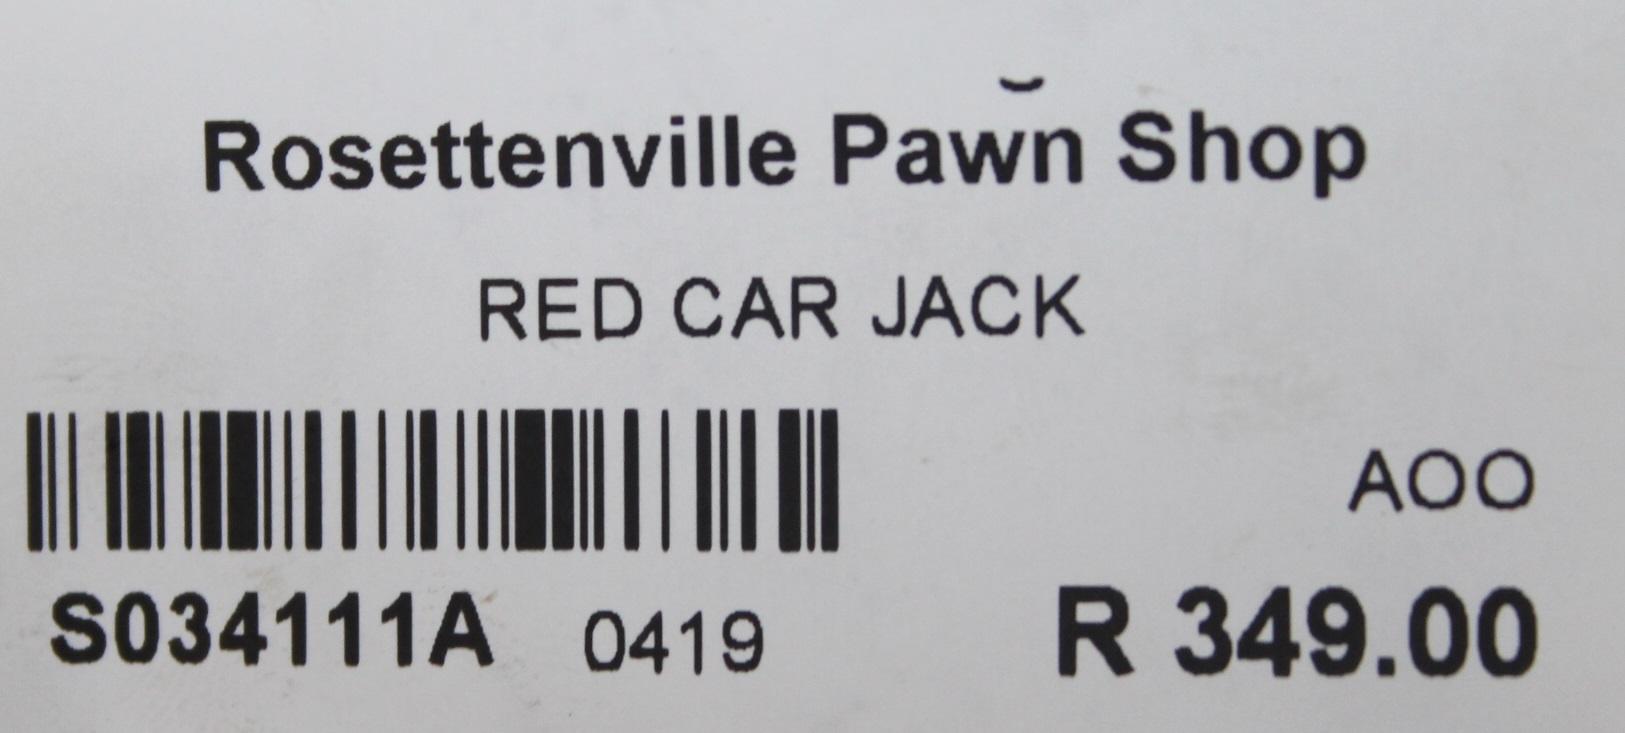 S034111A Red car jack #Rosettenvillepawnshop